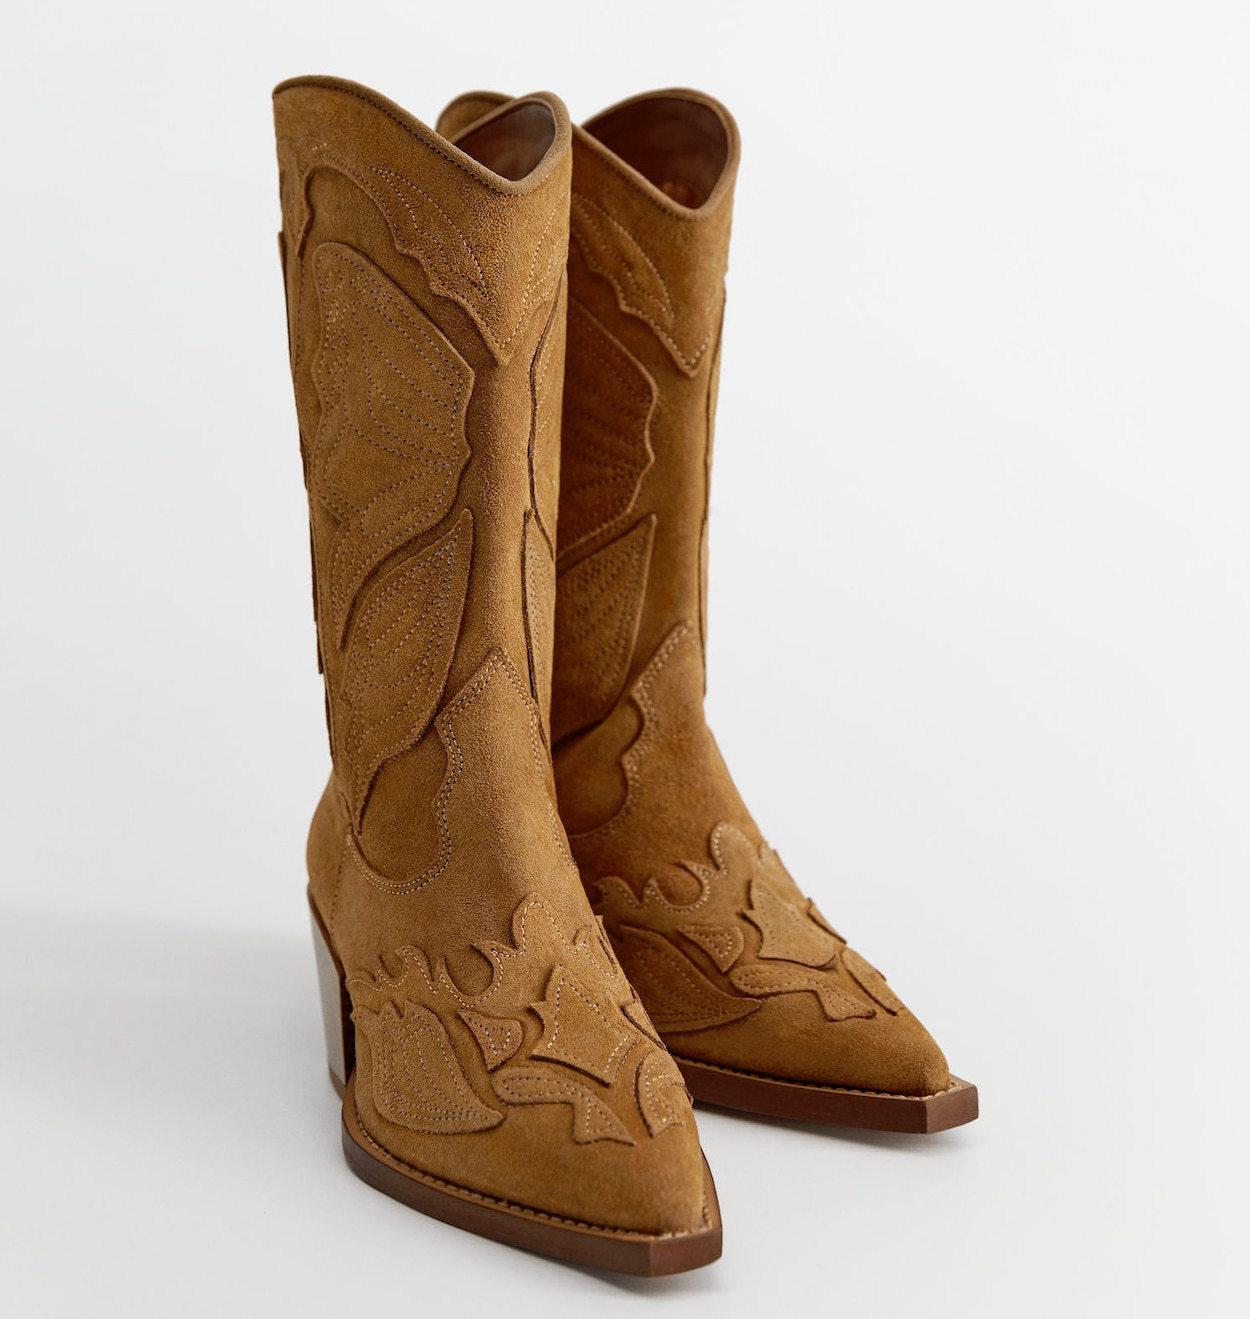 Botas cowboy de Mango Outlet.